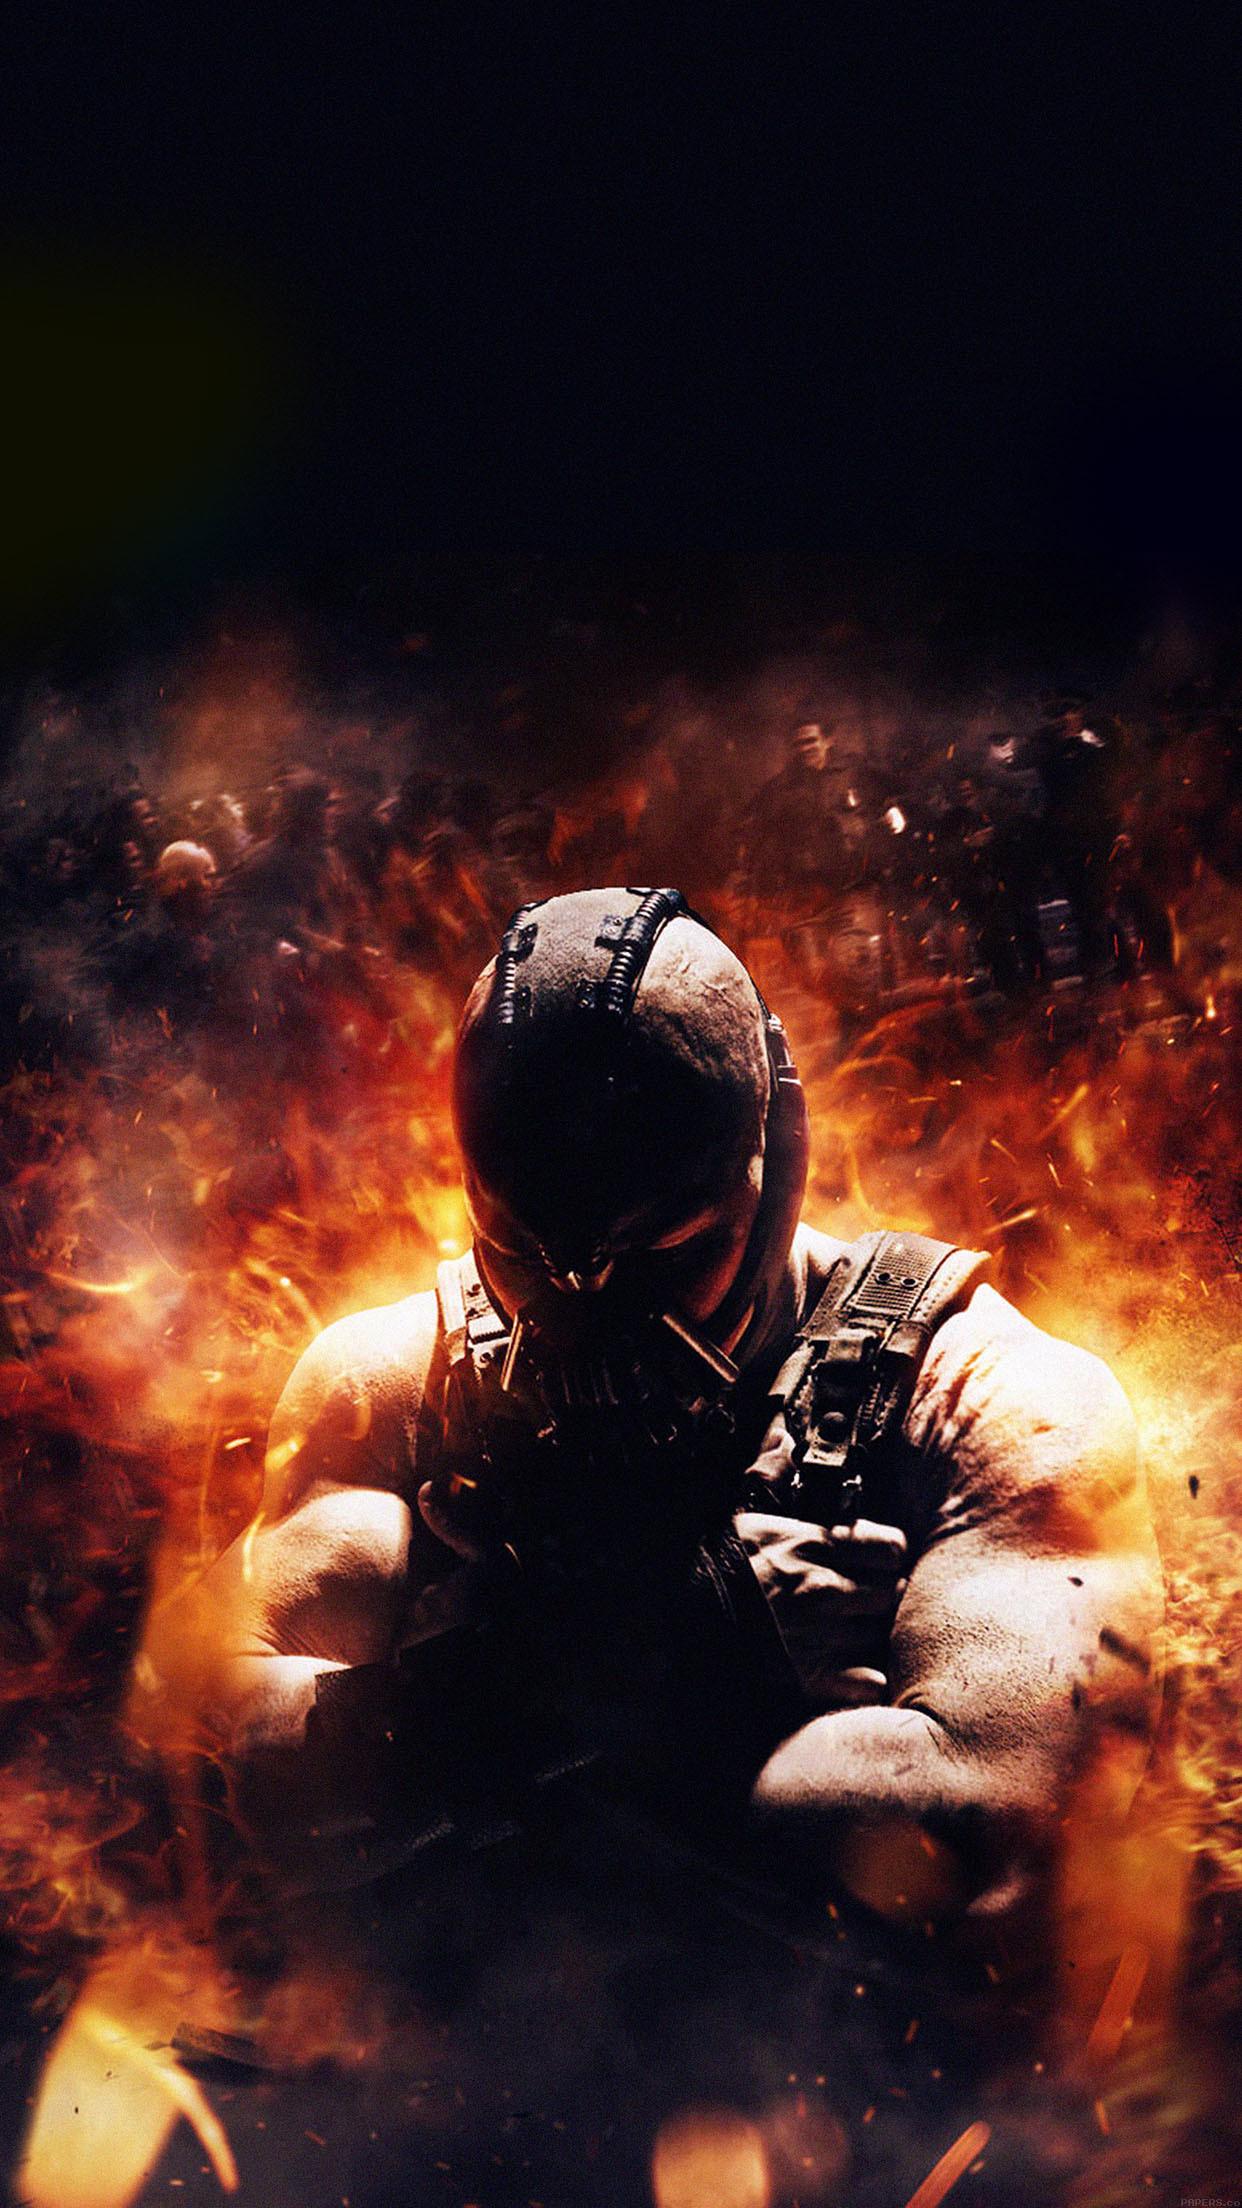 … wallpaper-dark-knight-rises-bane-fire-34-iphone6-